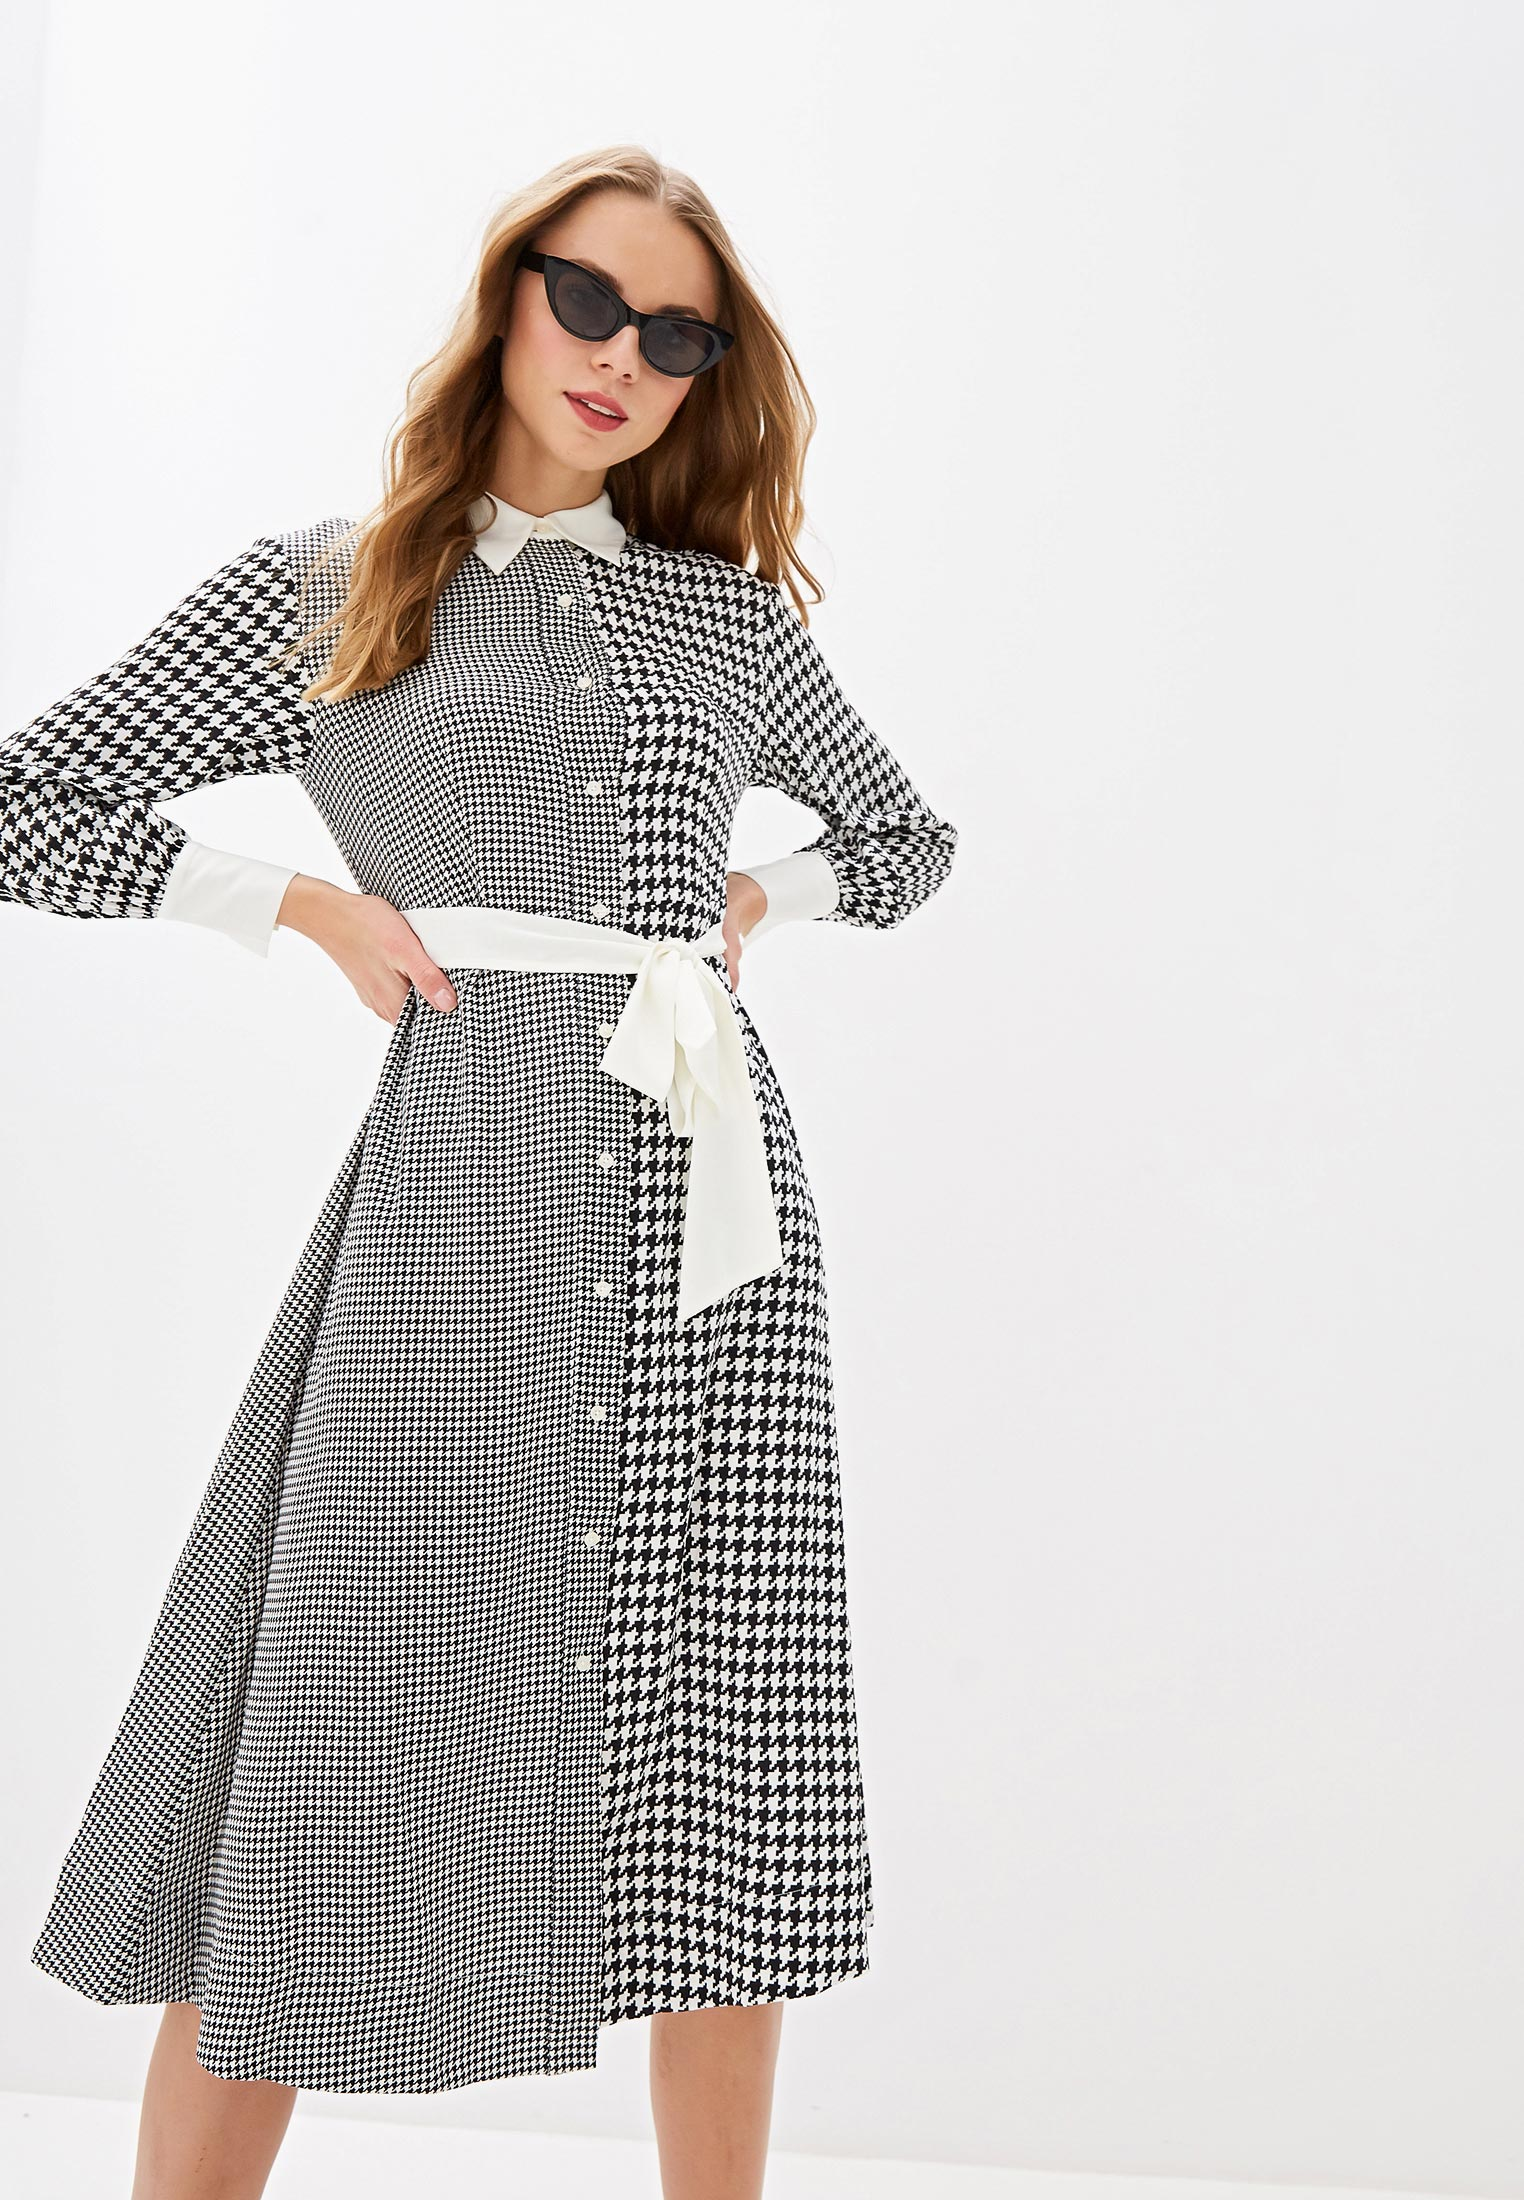 Платье Tommy Hilfiger (Томми Хилфигер) WW0WW25531